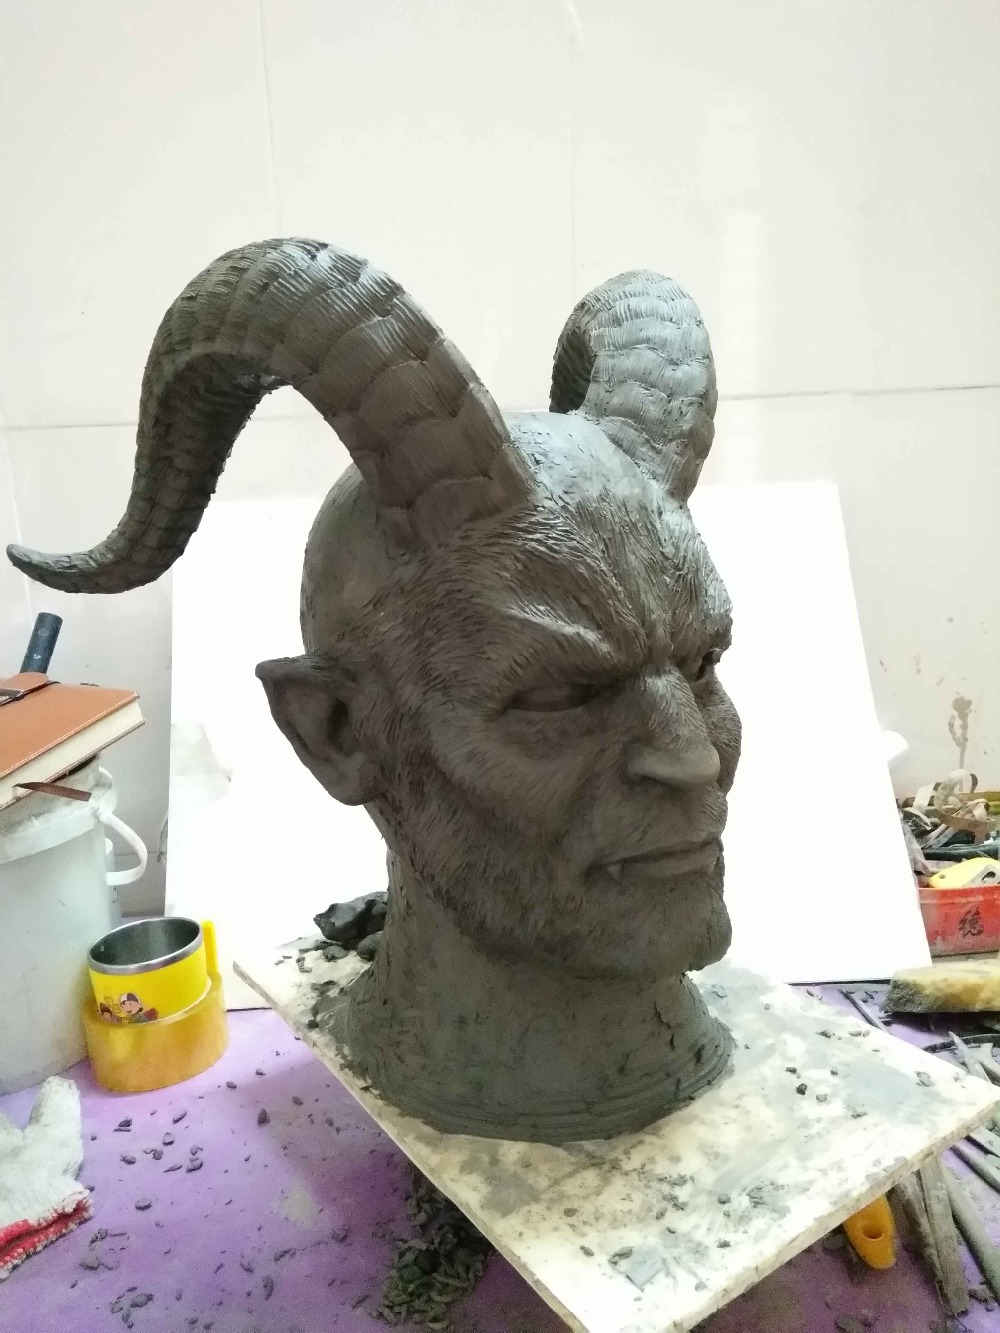 2017 Hot Disney Movie Beauty and the Beast Adam Mask Cosplay Horror Mask Latex Lion Helmet Halloween Party (4)